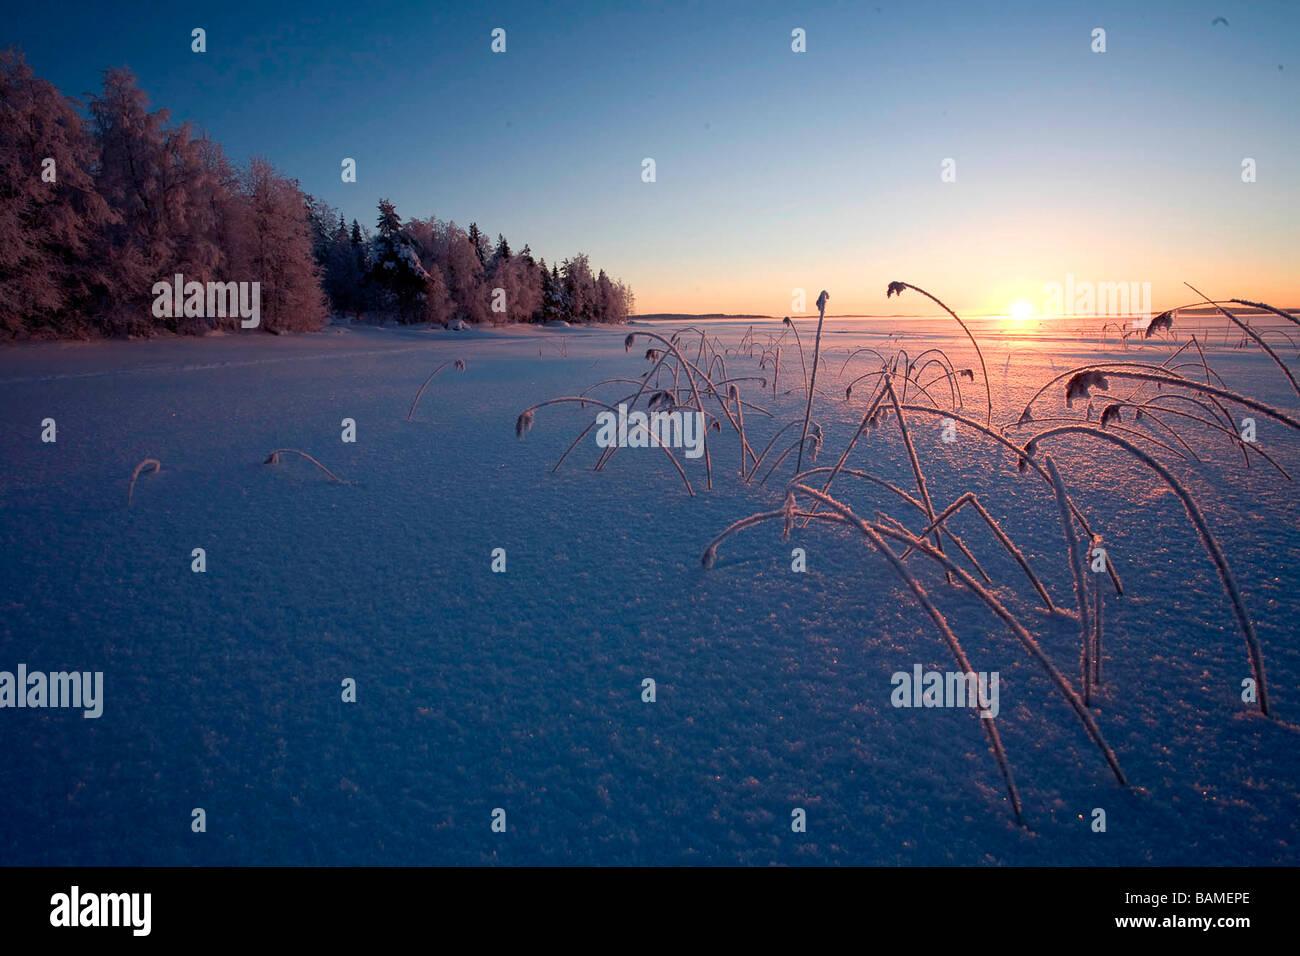 Finland, Lapland Province, Kuusamo, Ruka Jarvi, sunrise over the Taiga - Stock Image